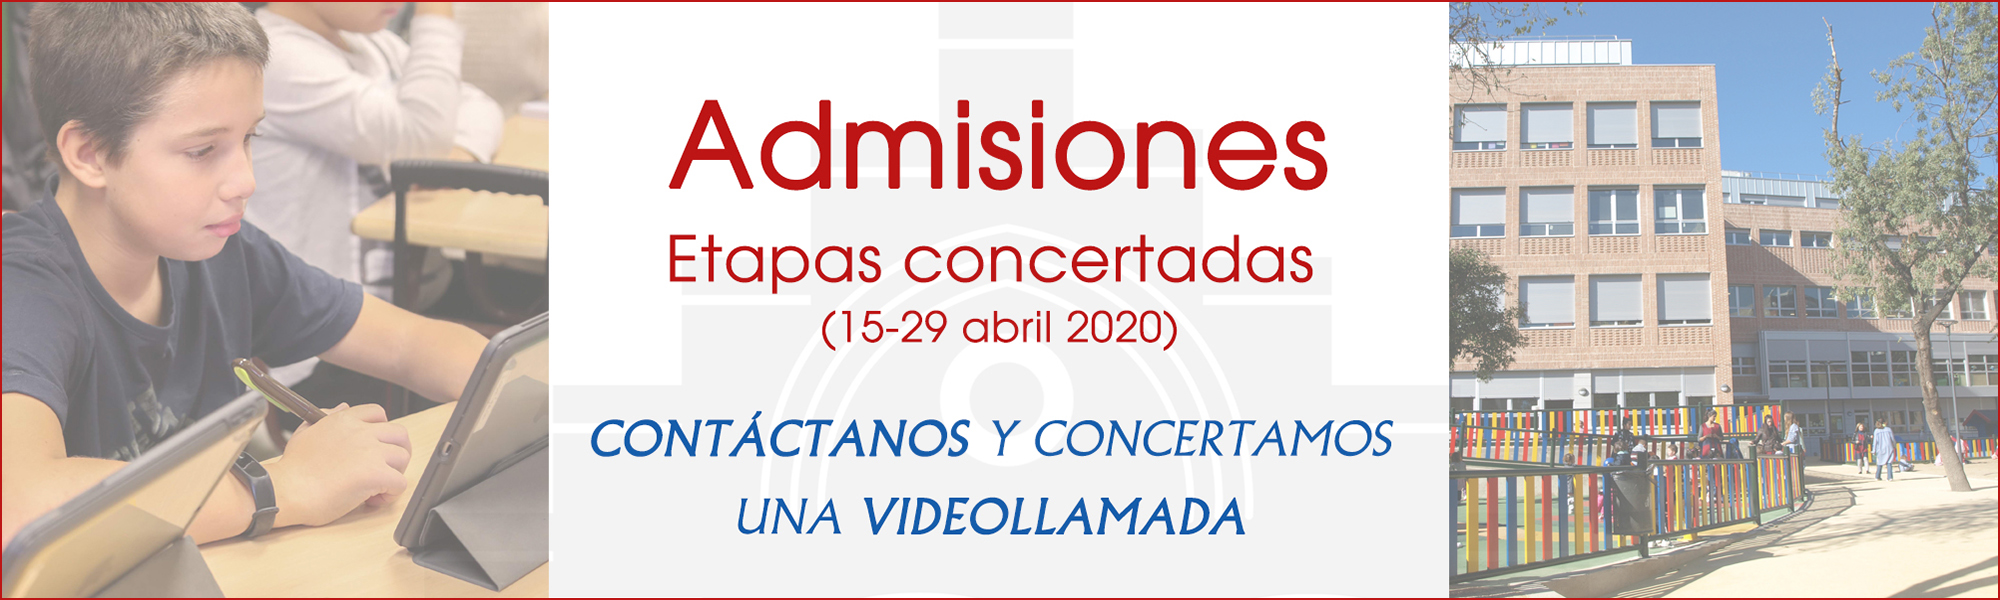 Admisiones etapas concertadas curso 2020-2021